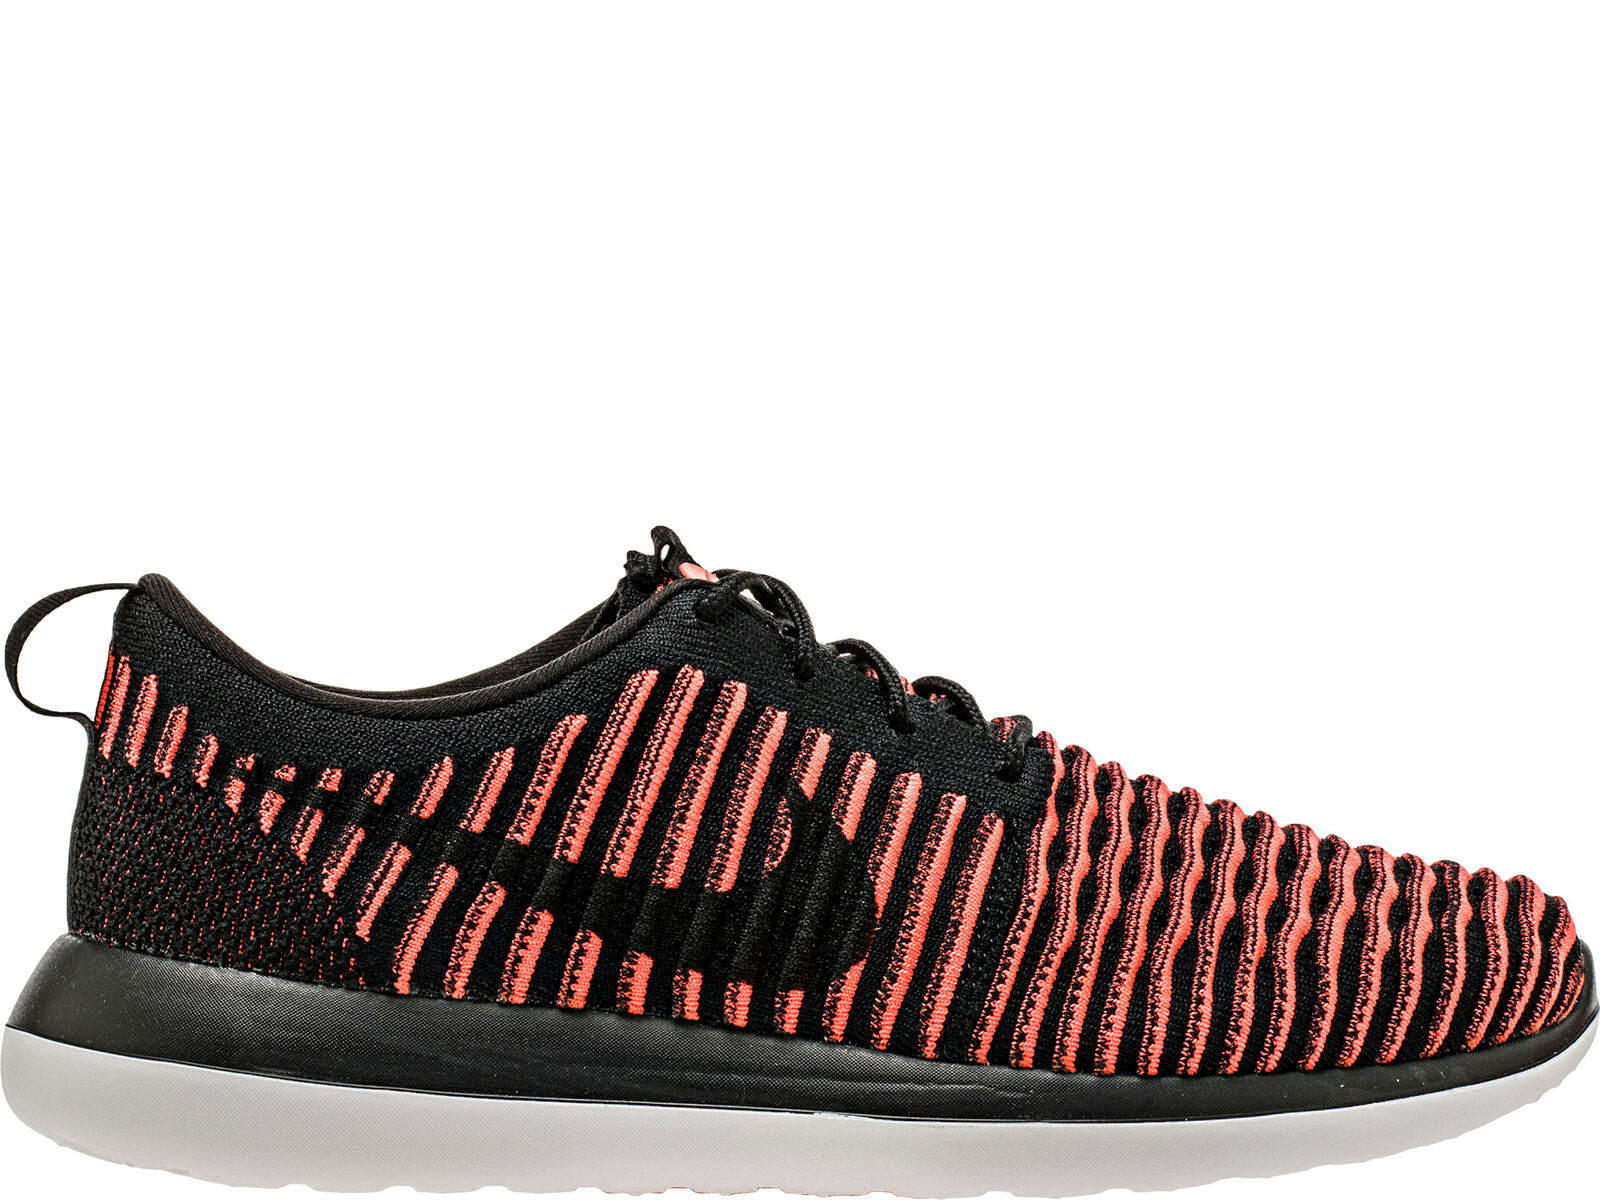 Nike Roshe Two Flyknit Rosherun 2 Preto Homens vermelho Homens Preto Running Shoe a77922